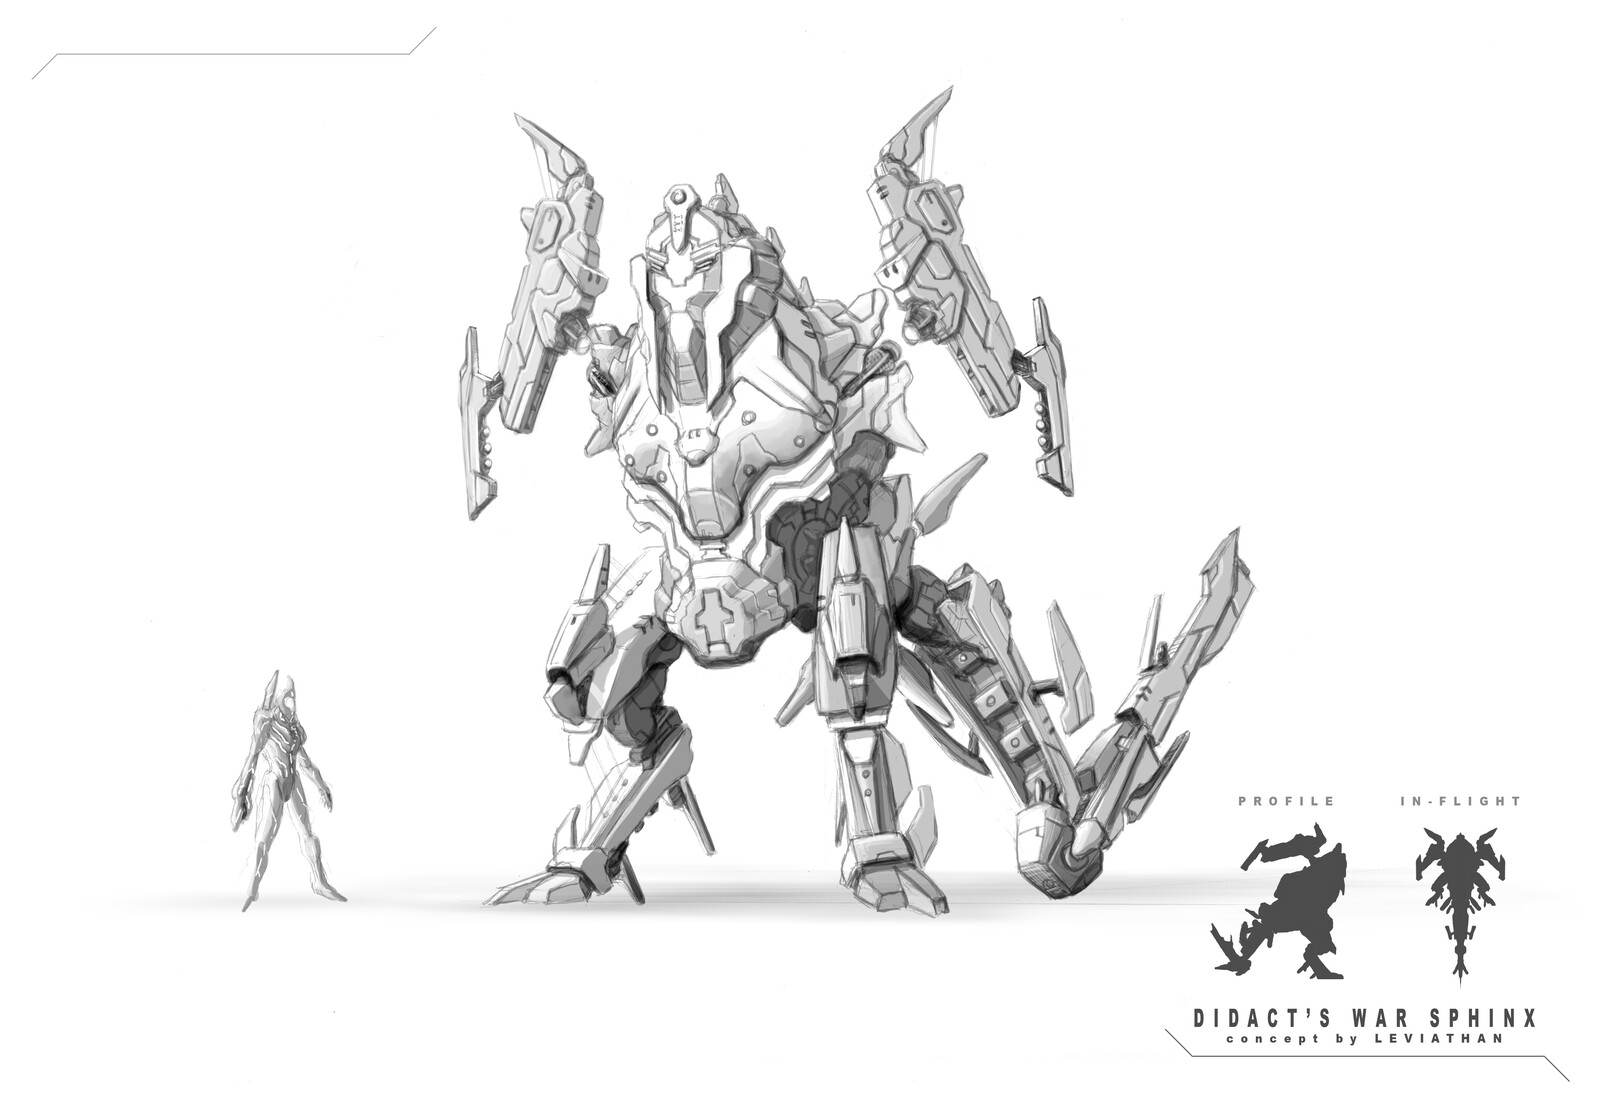 Didact's War Sphinx